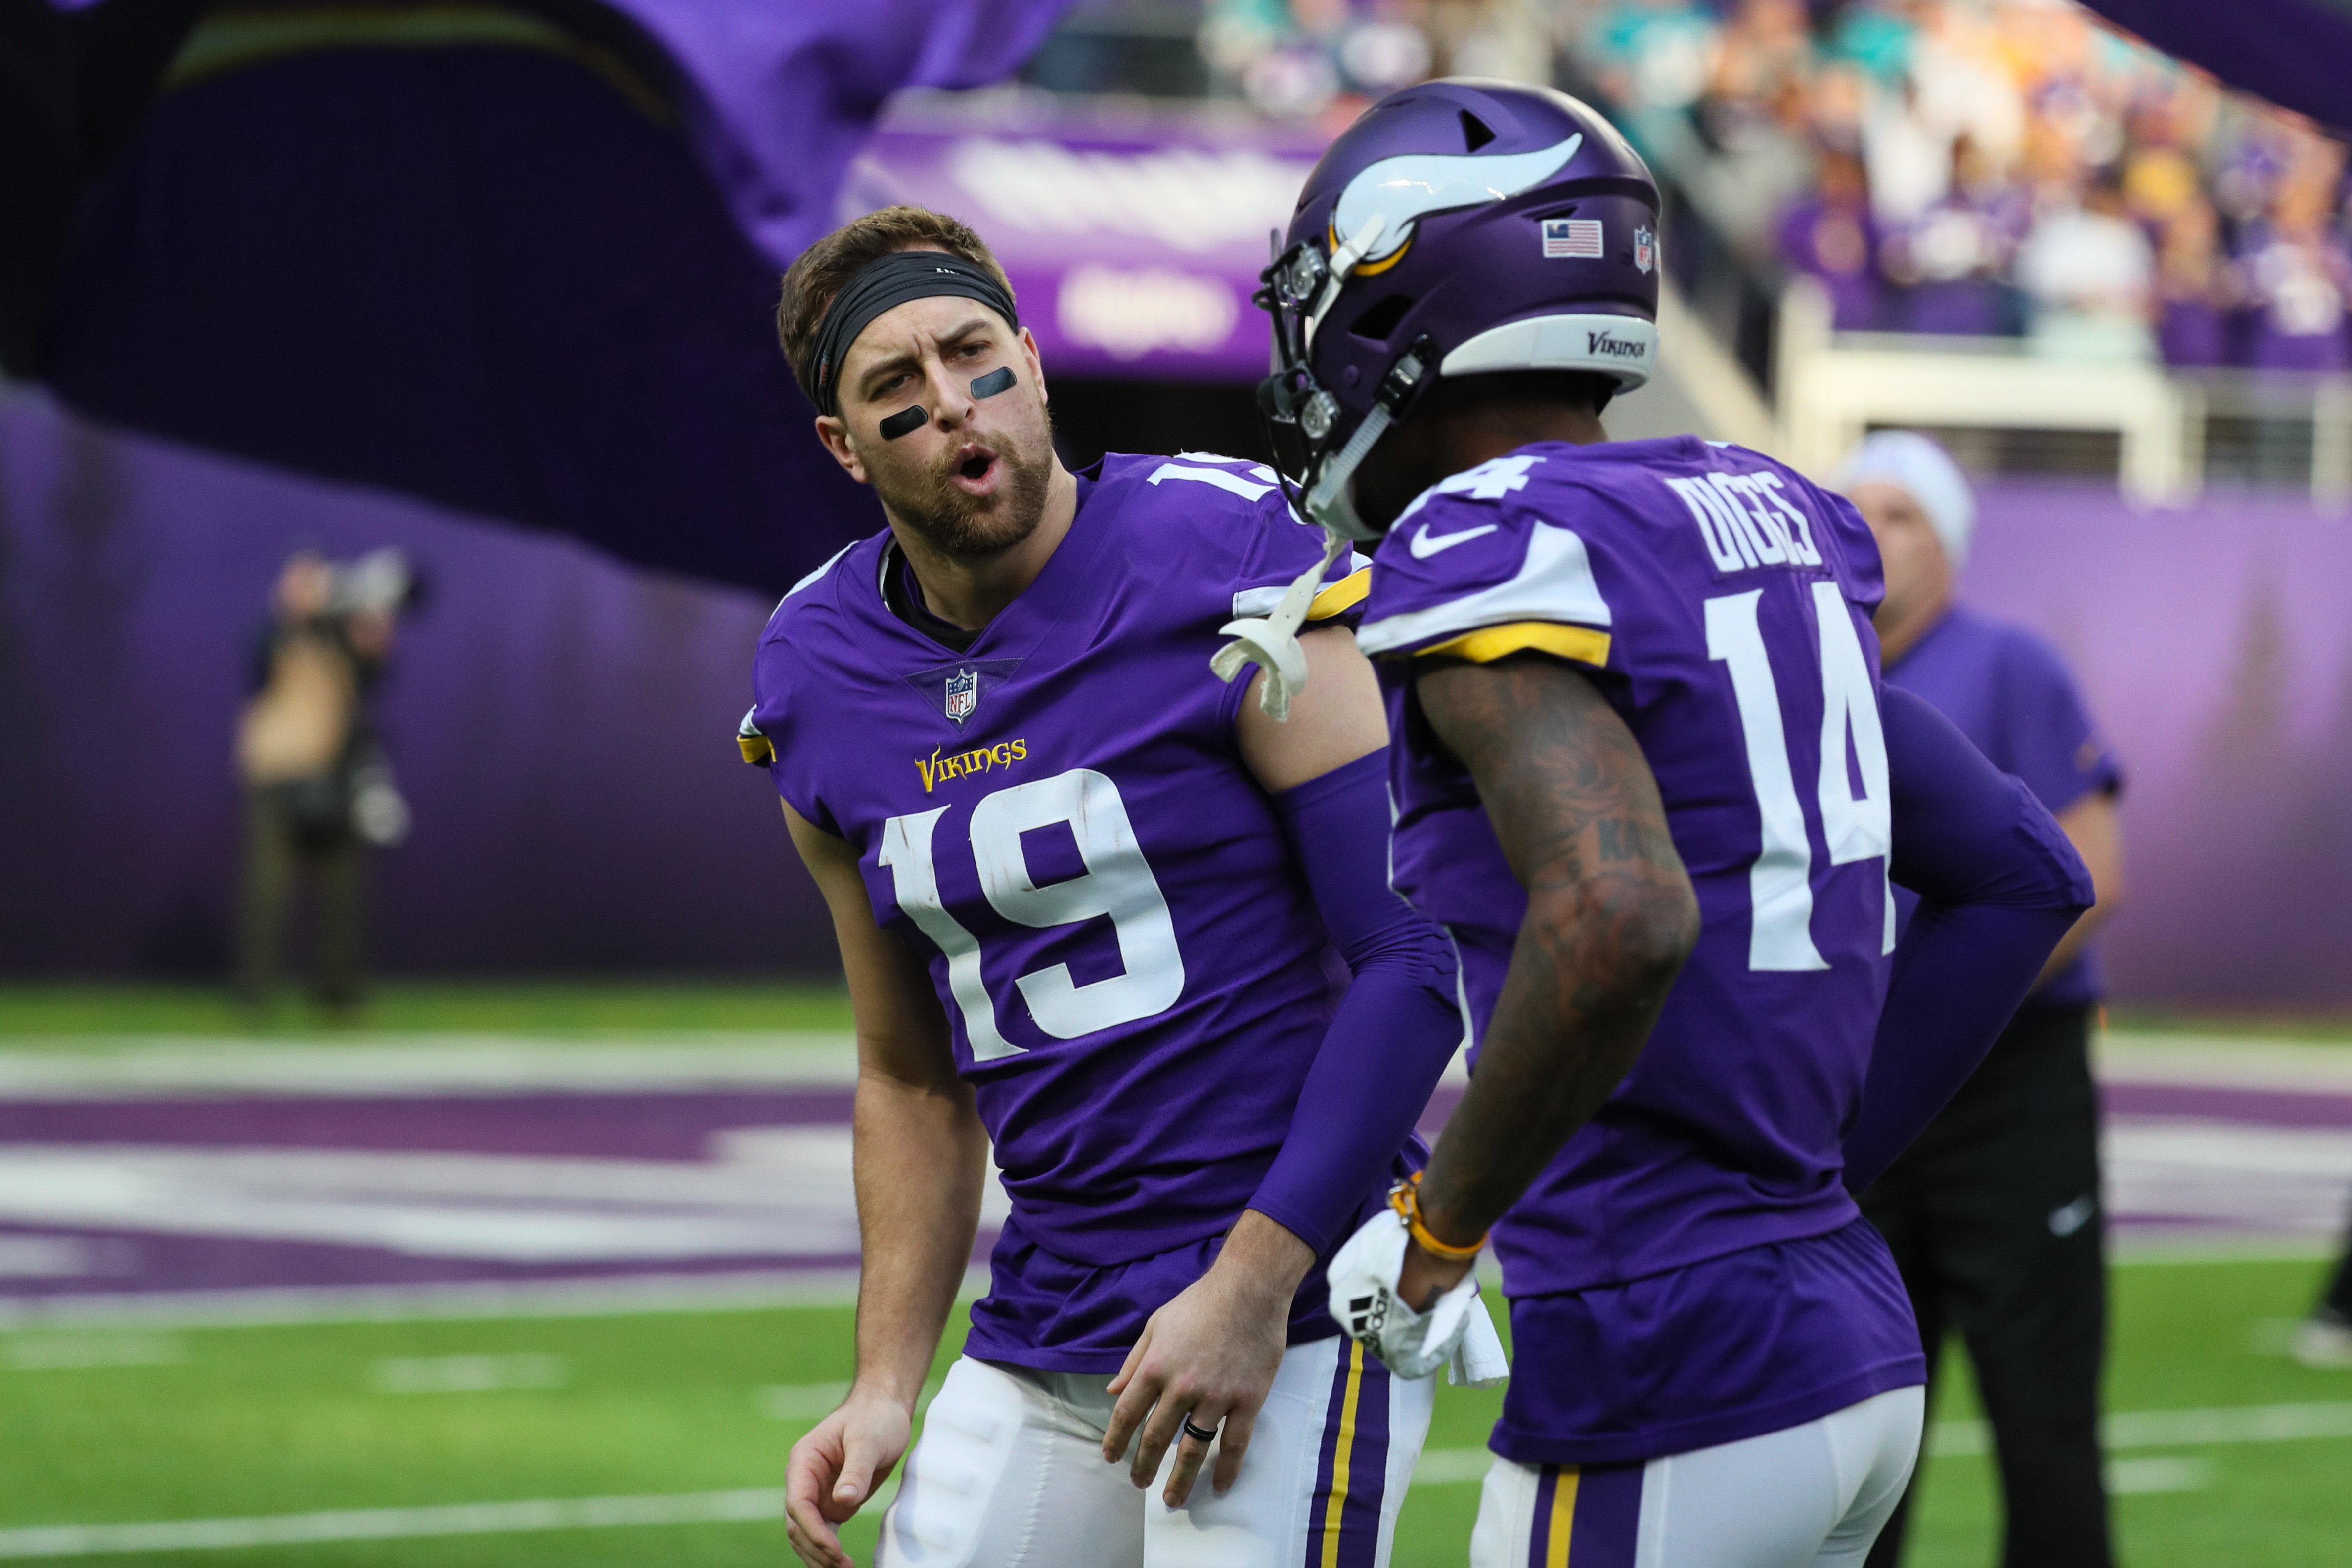 NFL: DEC 16 Dolphins at Vikings